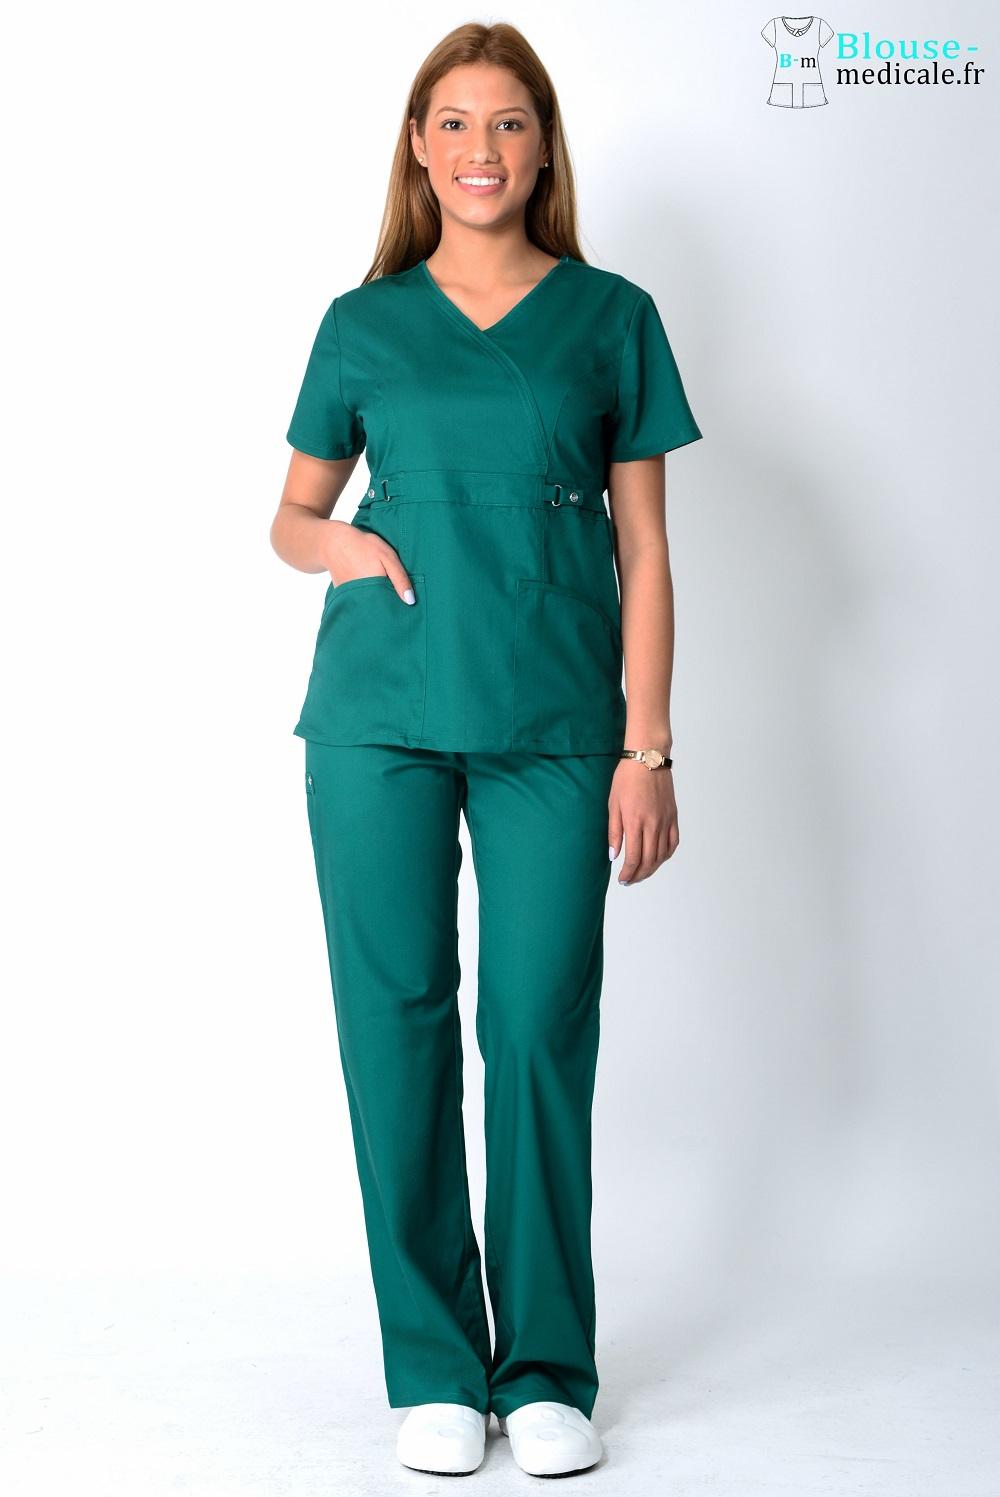 tenue médicale cherokee infirmière